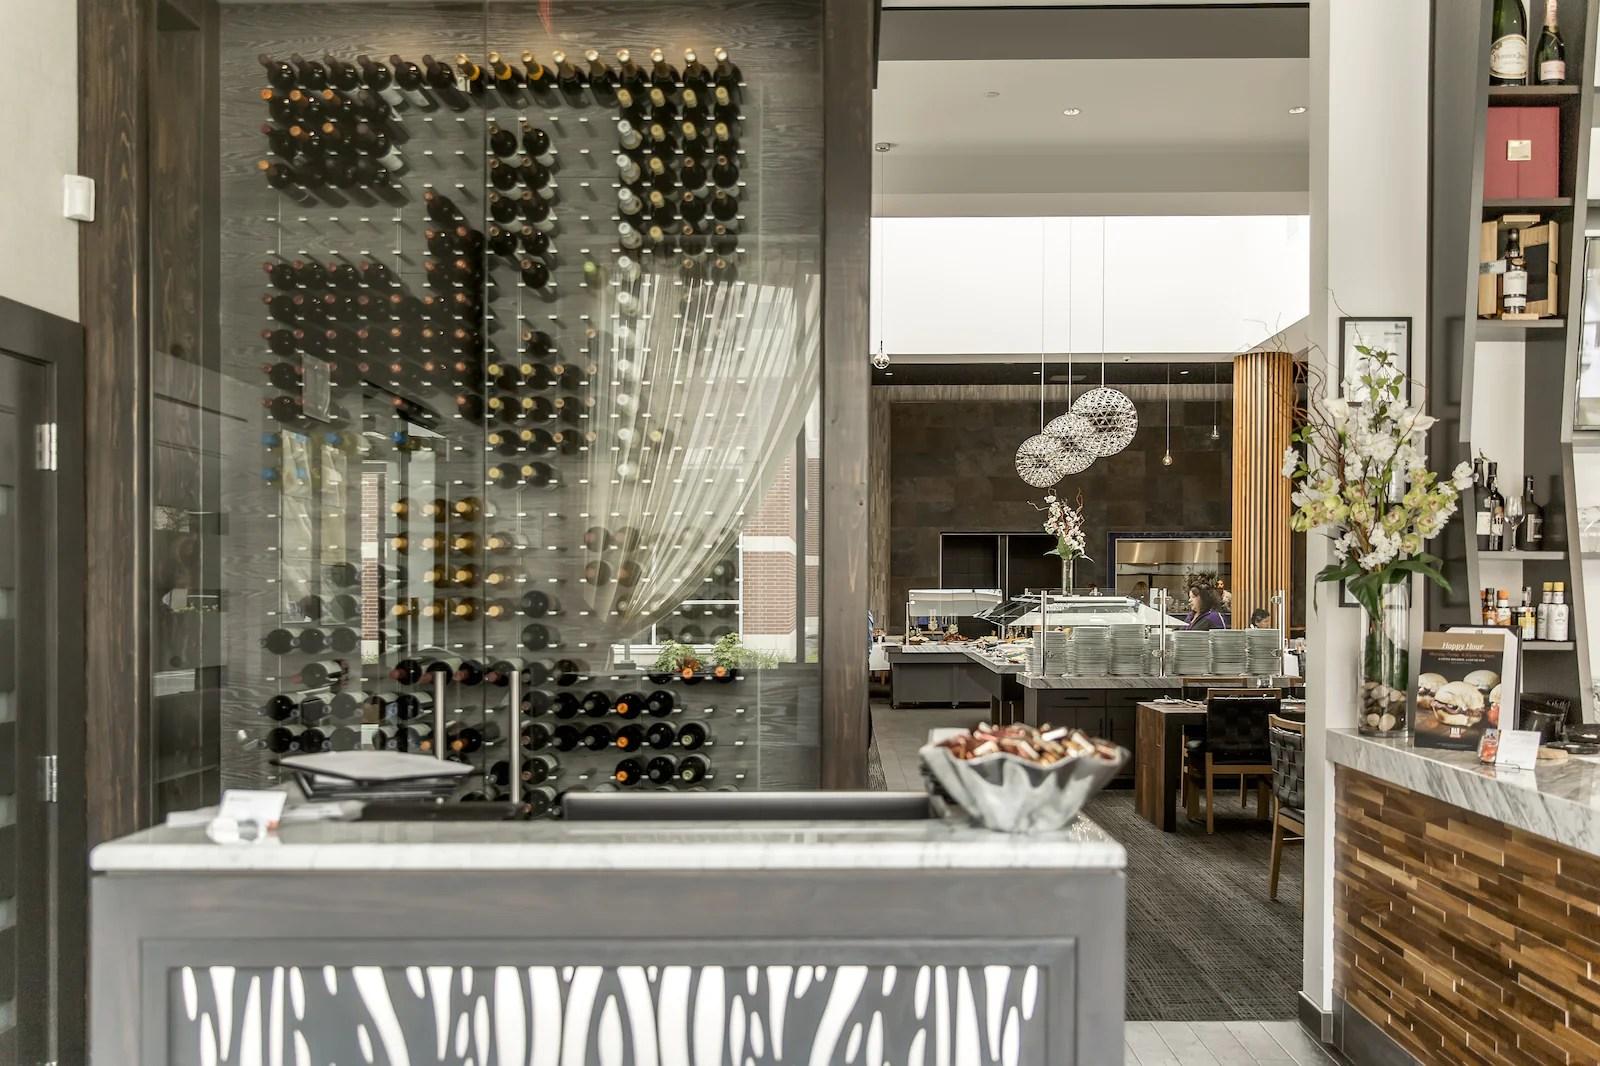 Wine Displays Restaurants And Bars Stact Racks